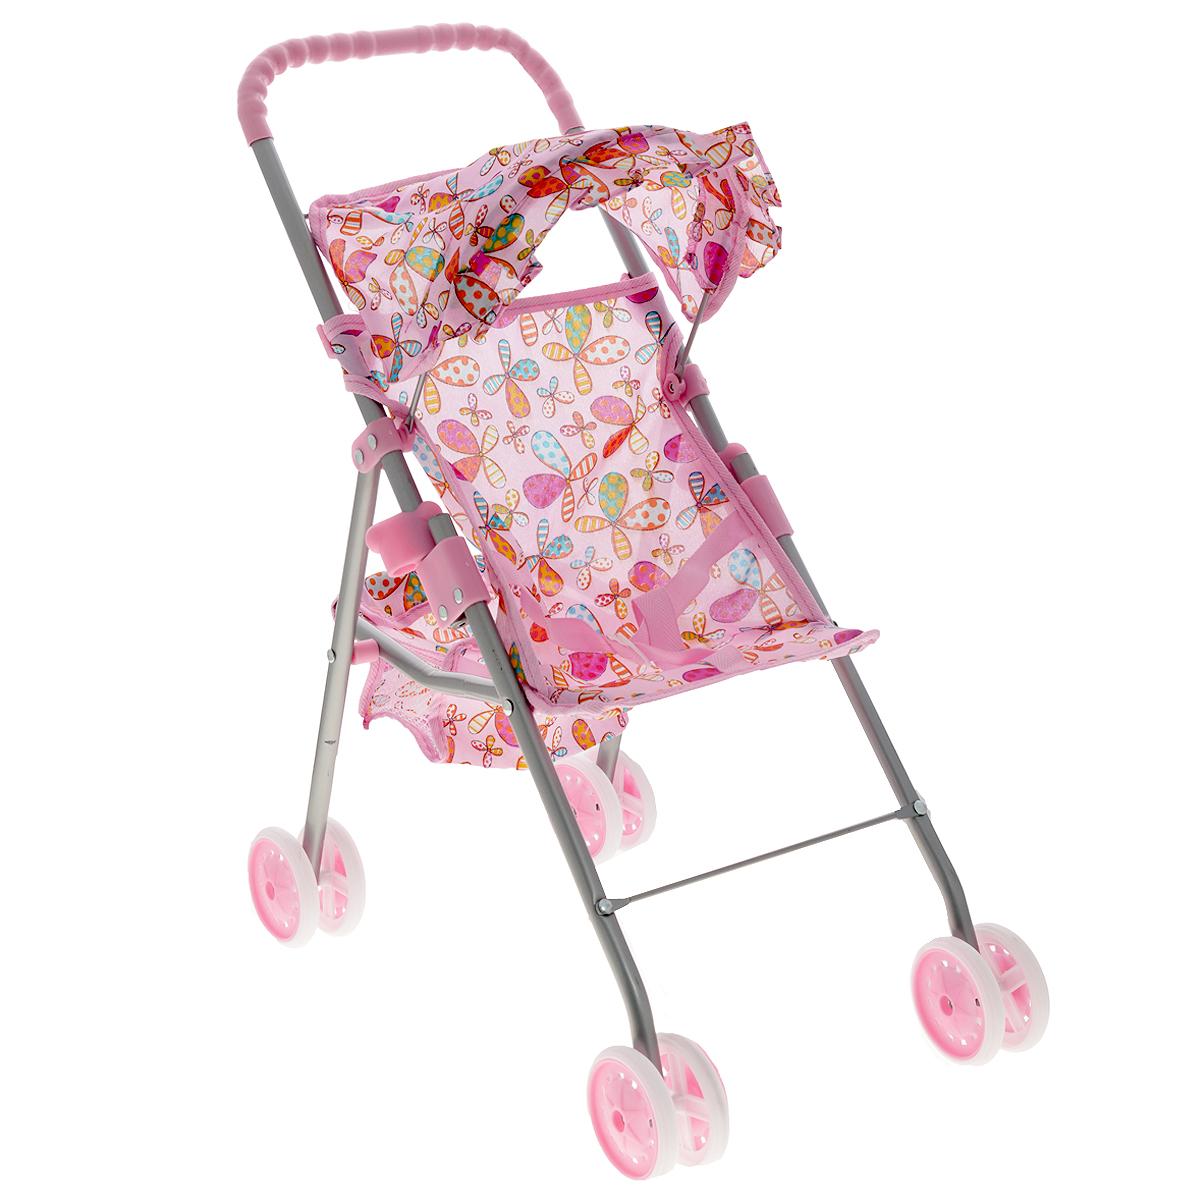 "Прогулочная коляска для кукол ""Melobo"", цвет: розовый с цветочками"